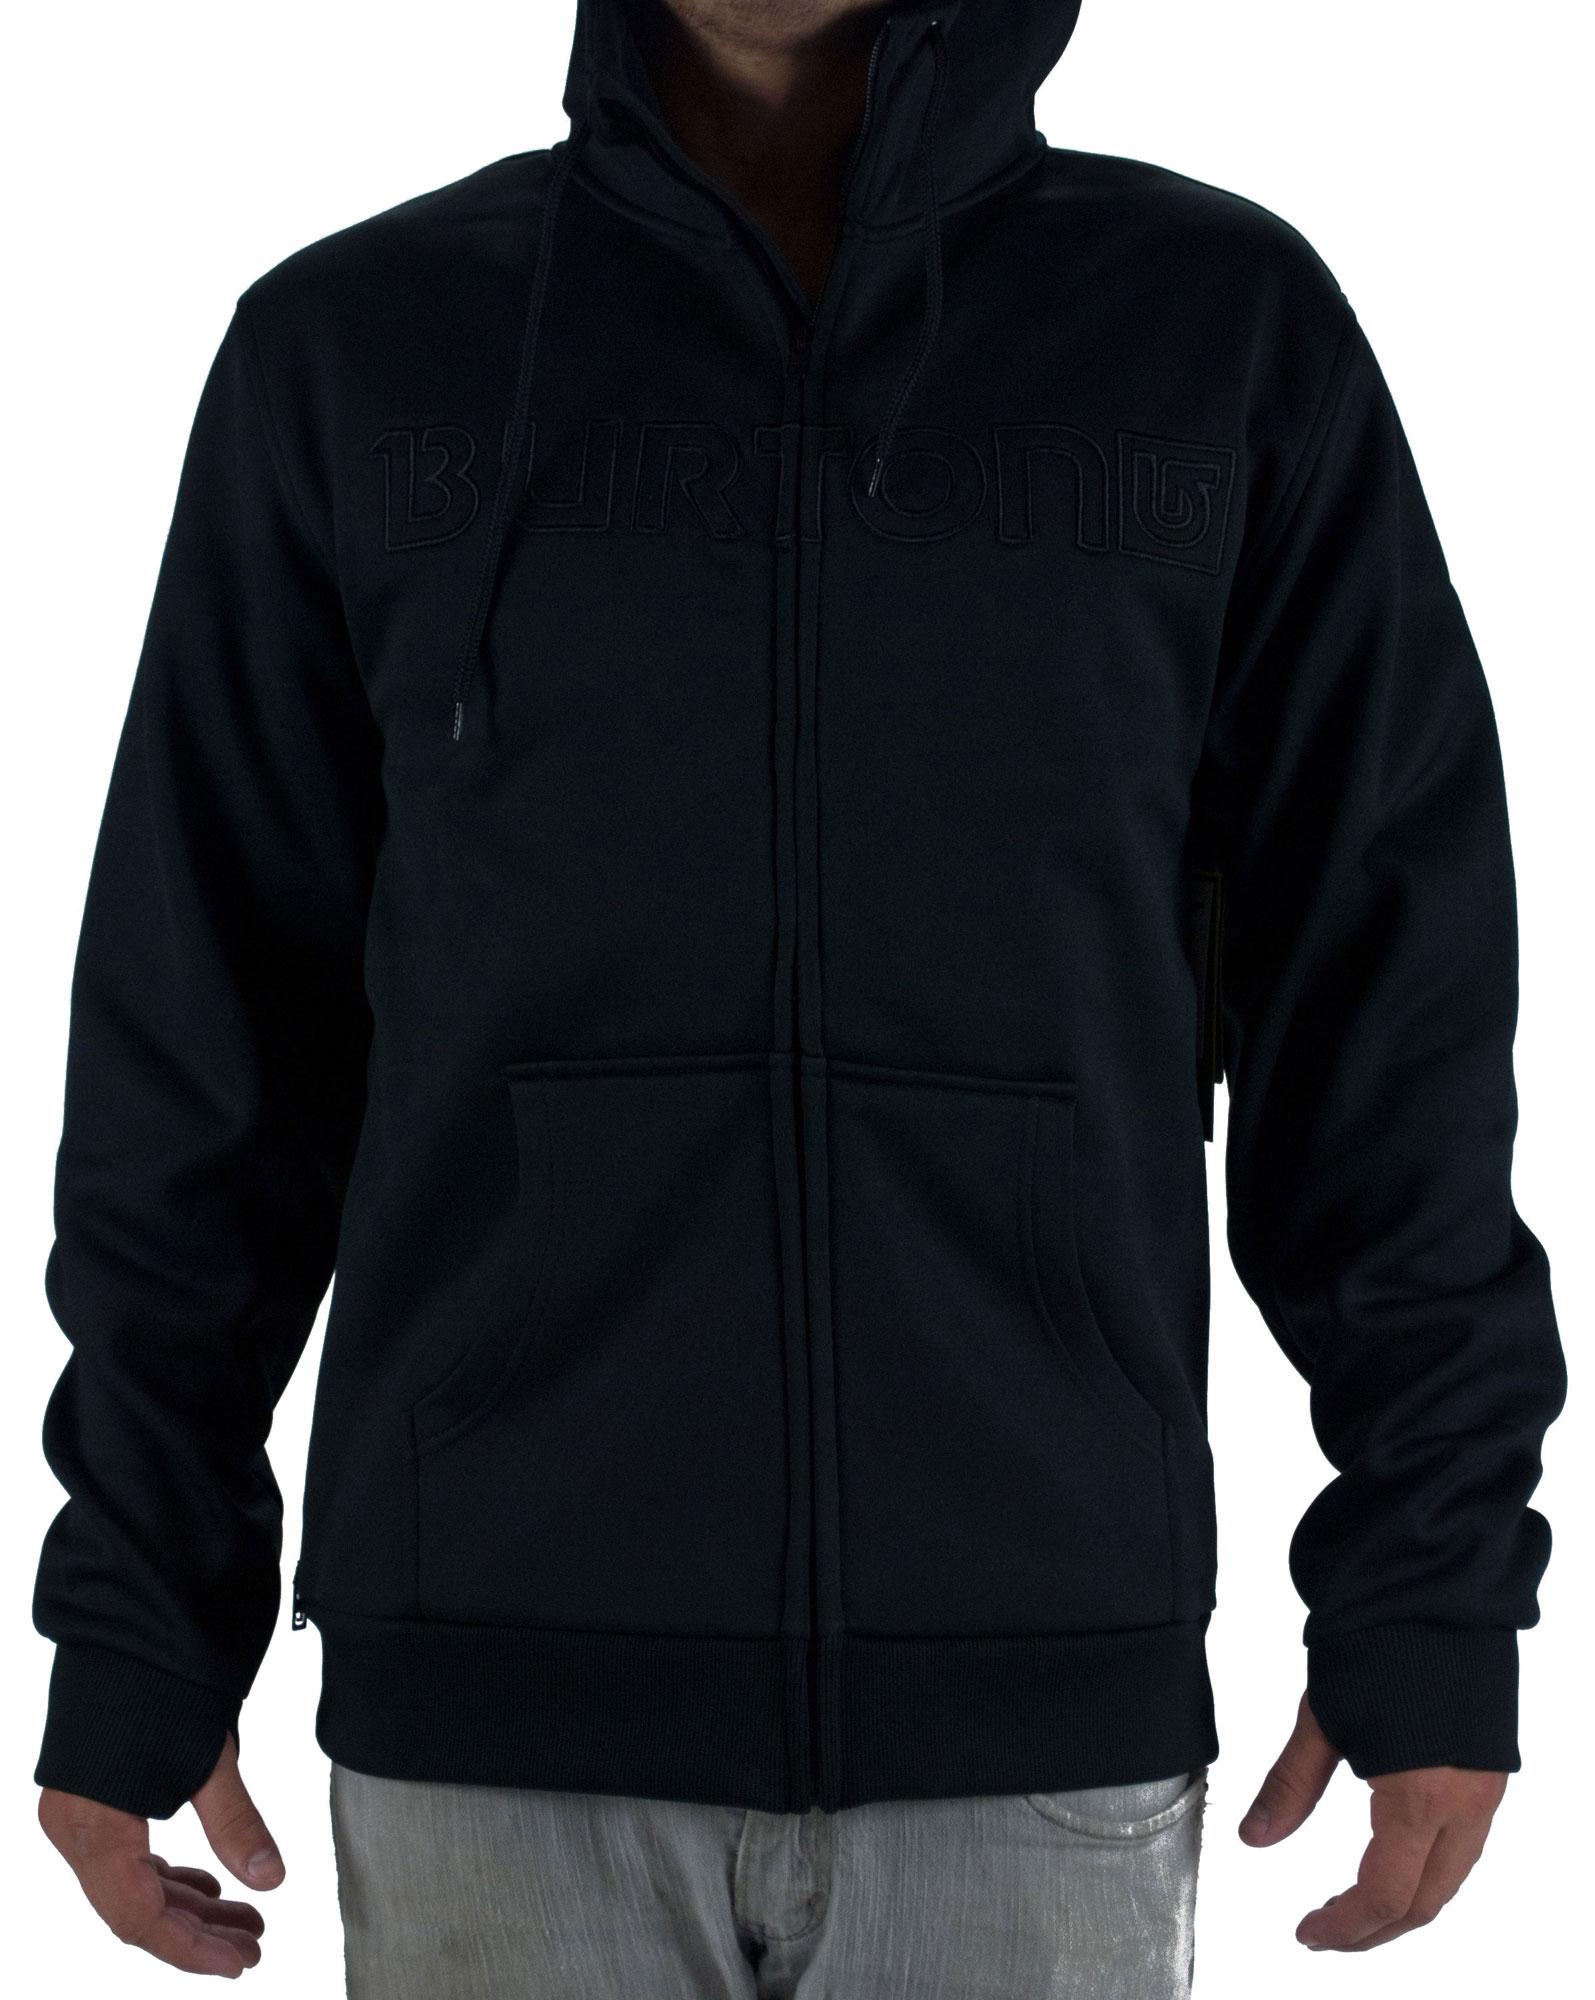 Pullover hoodie template